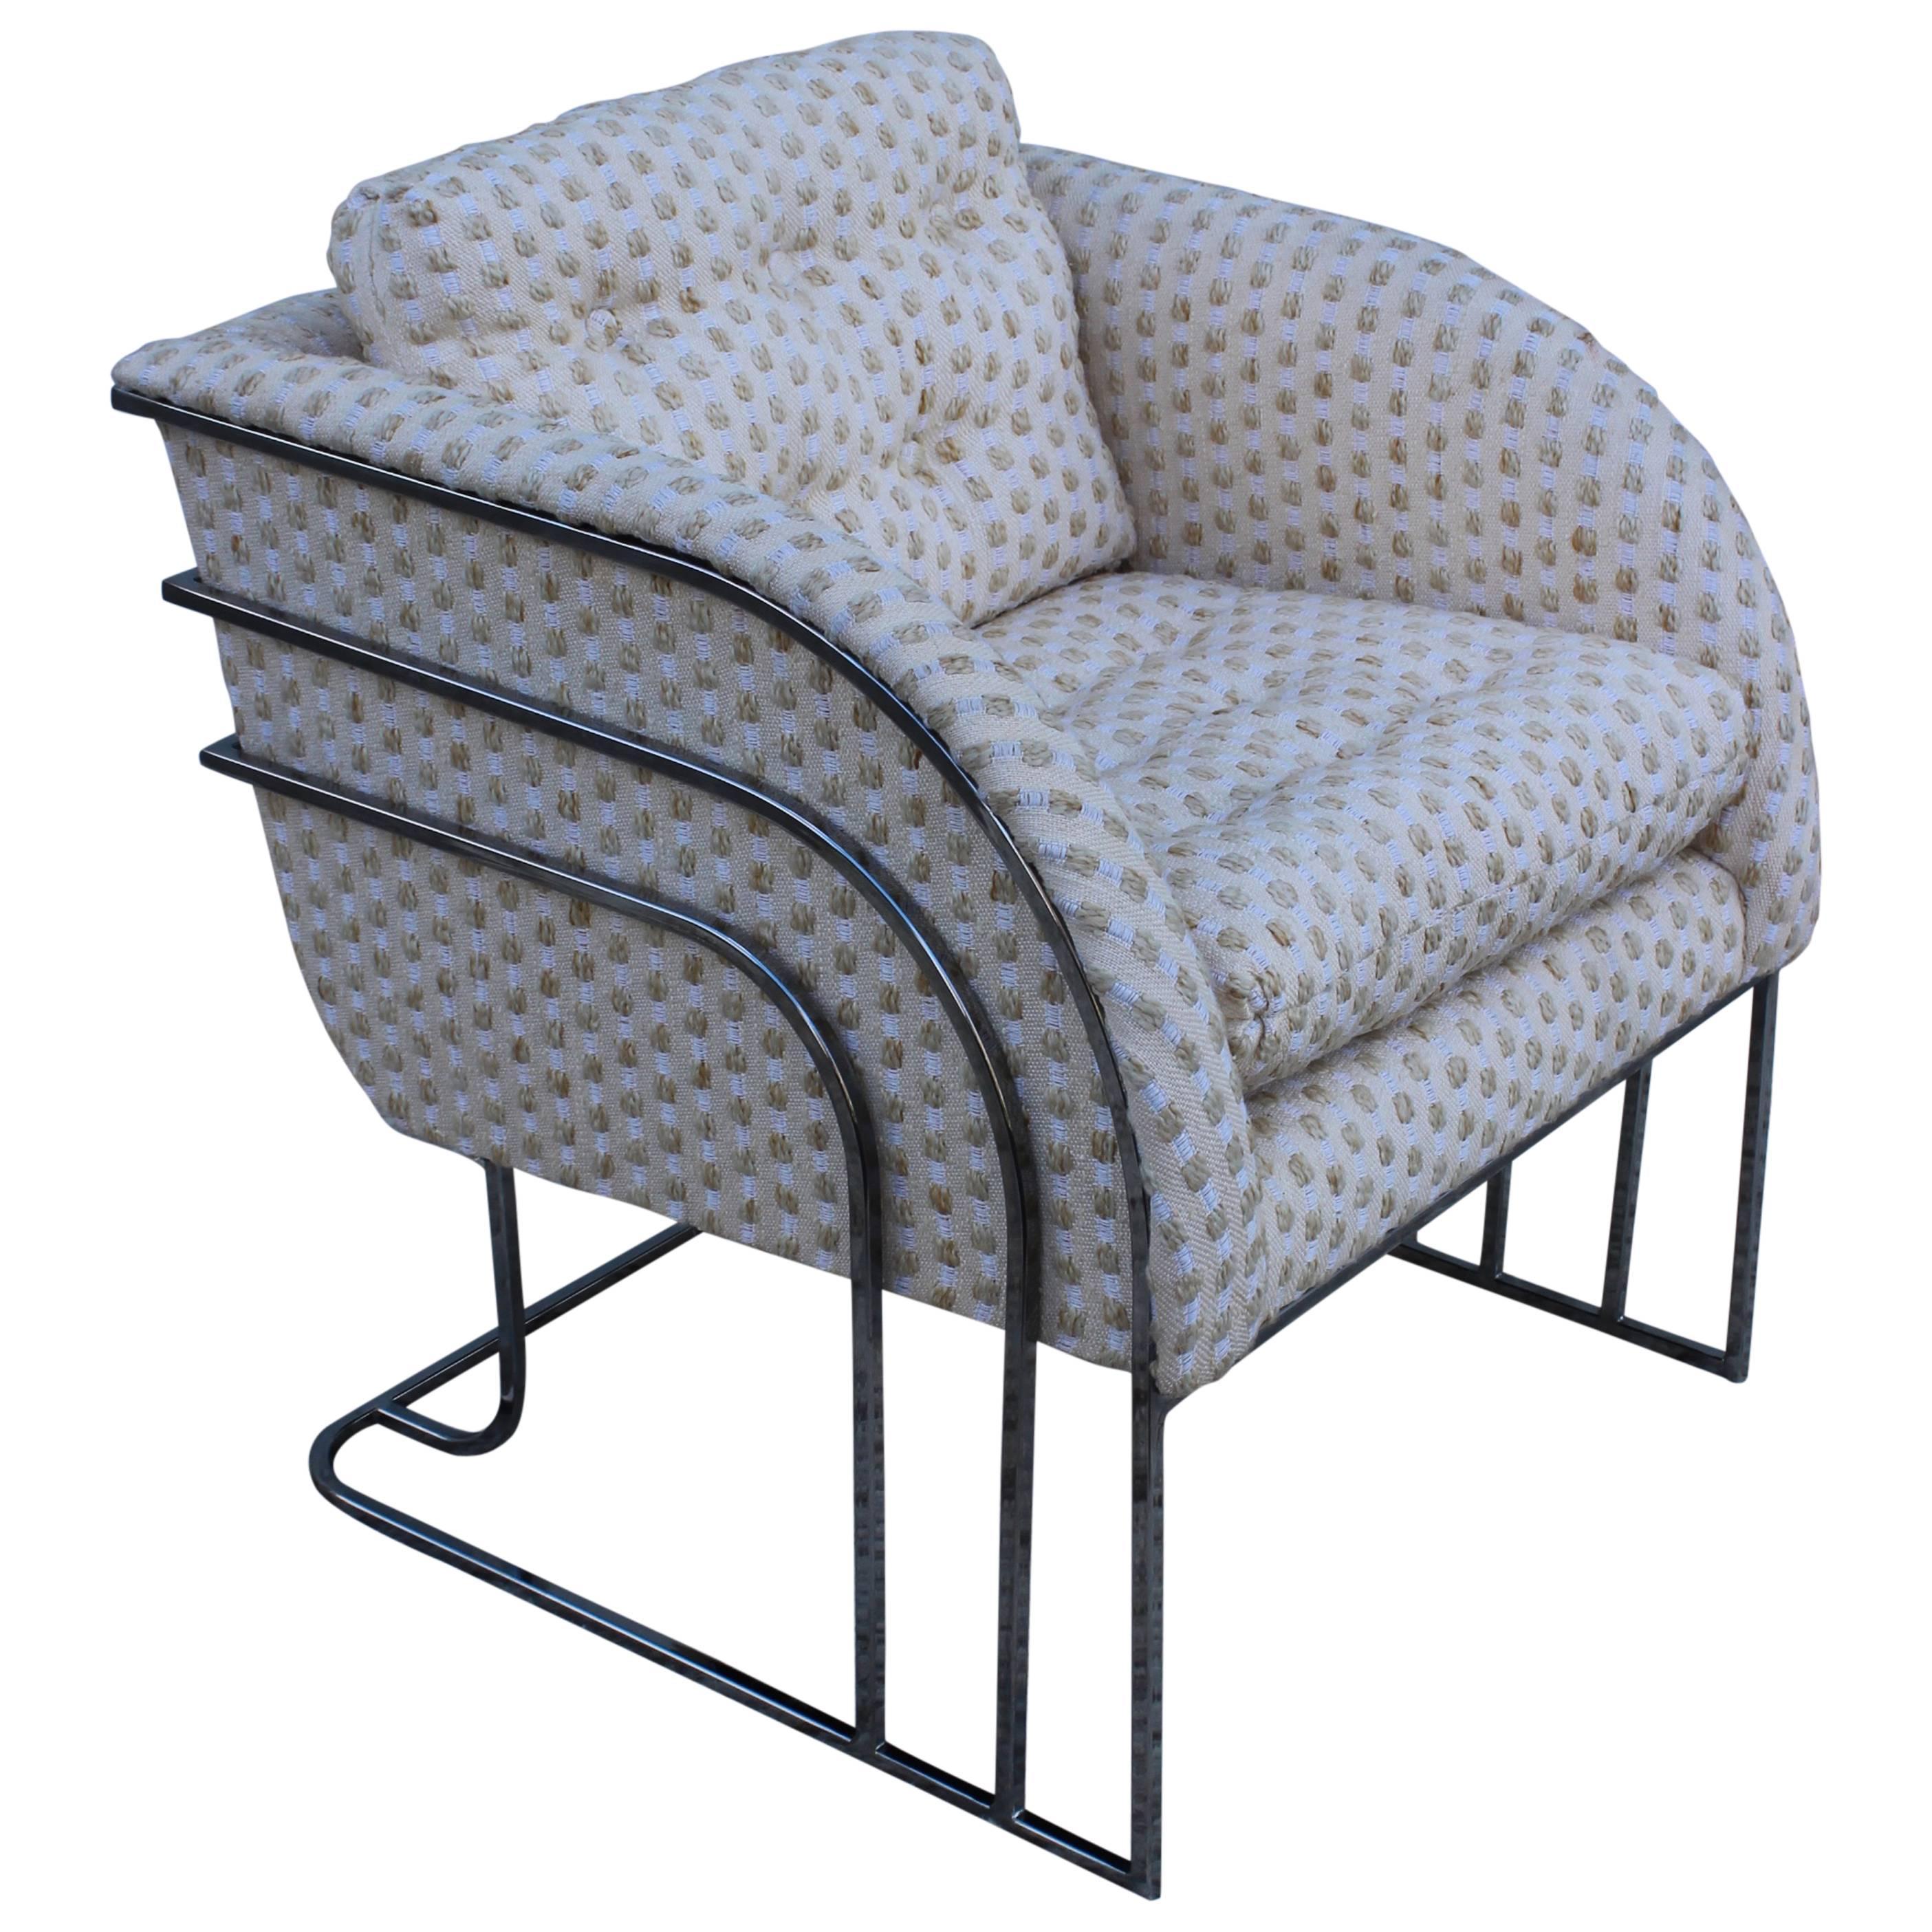 Chrome Lounge Chair by George Mergenov for Weiman/Warren Lloyd